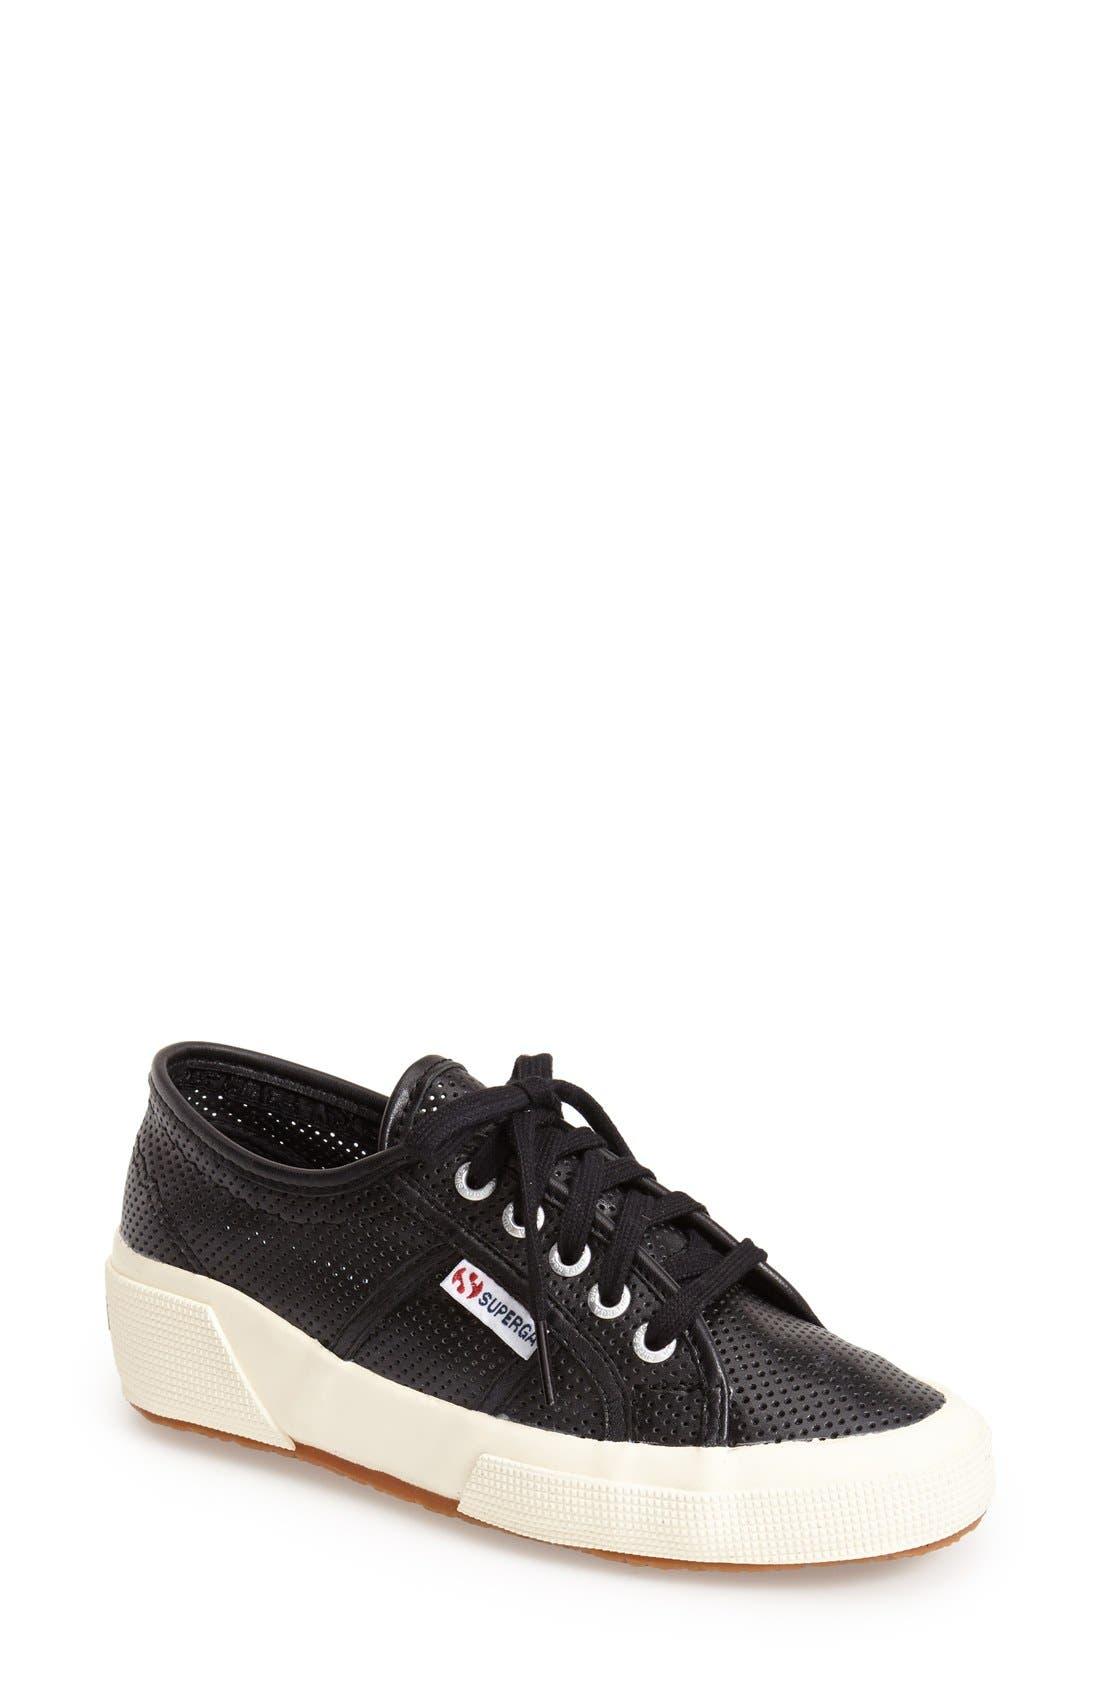 Main Image - Superga 'Perforated Cotu' Leather Sneaker (Women)